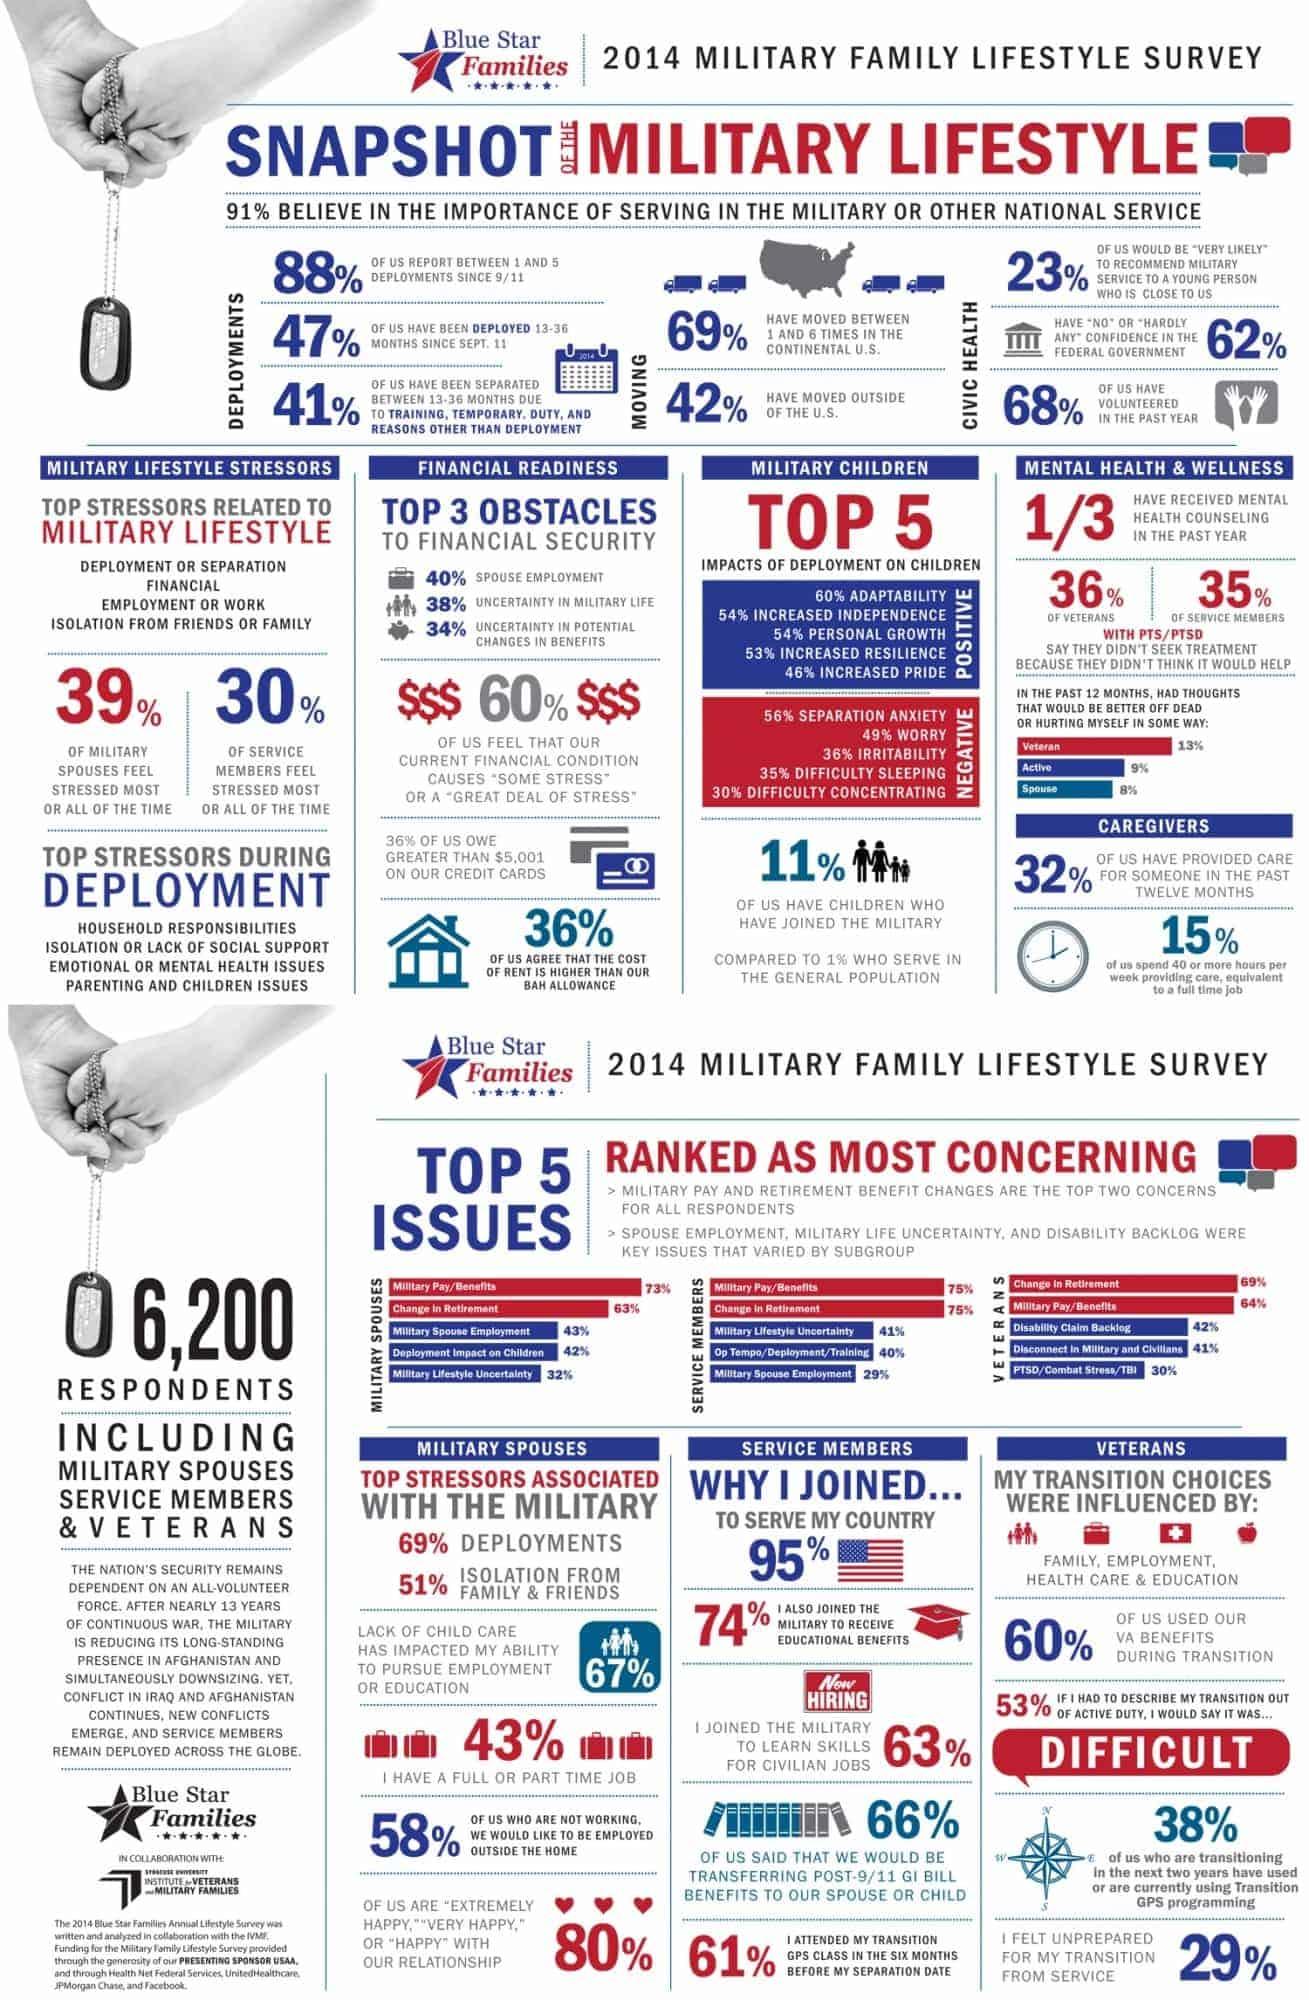 2014-military-family-lifestyle-survey-full